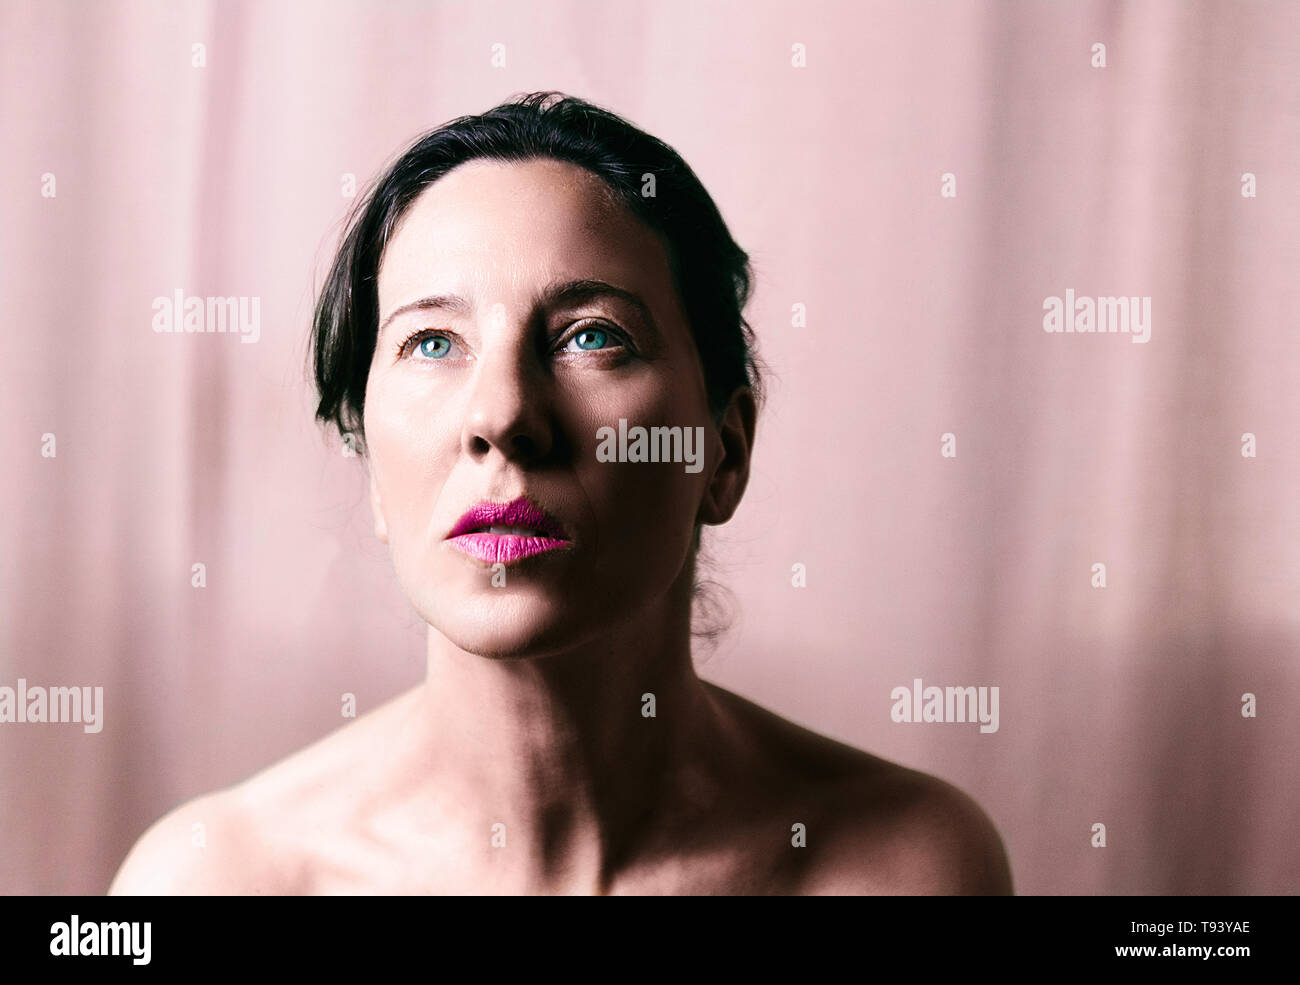 beauty in pink tones - Stock Image